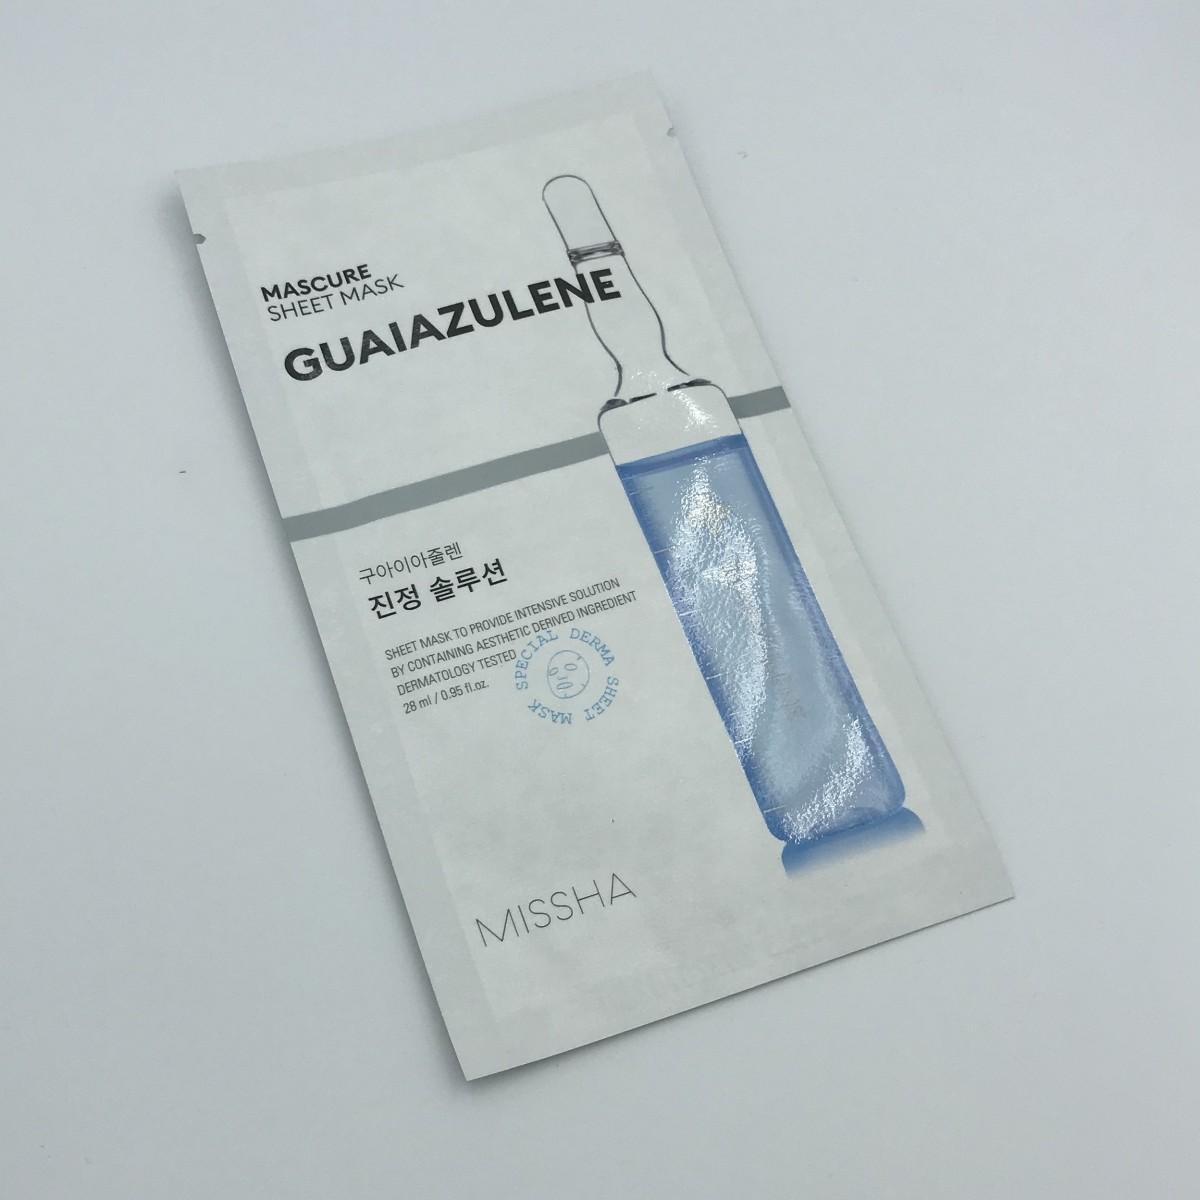 Тканевая маска для лица успокаивающая MISSHA MASCURE CALMING SOLUTION SHEET MASK GUAIAZULENE - 27 мл